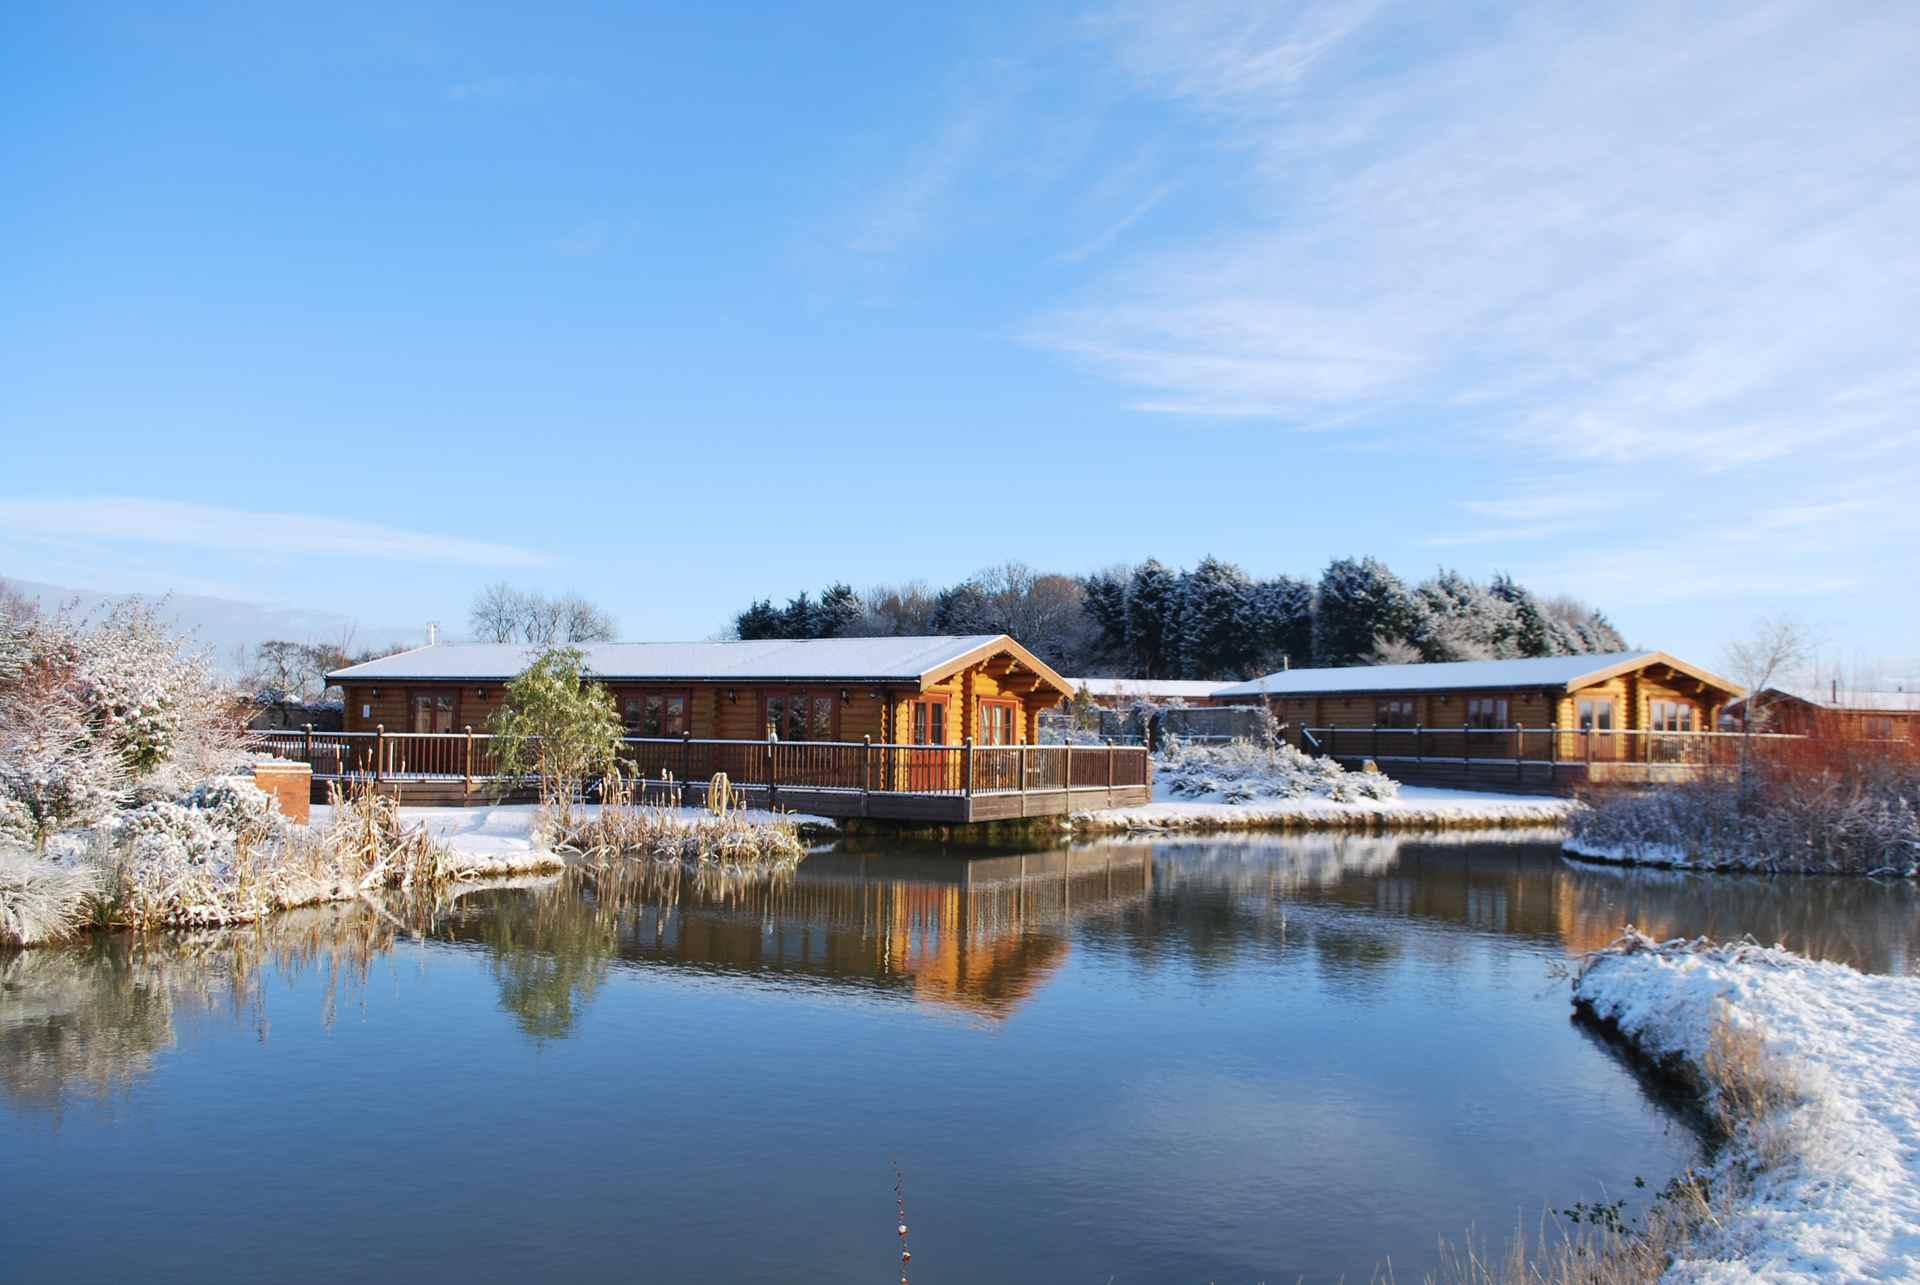 cherry lodge eyekettleby lakes winter